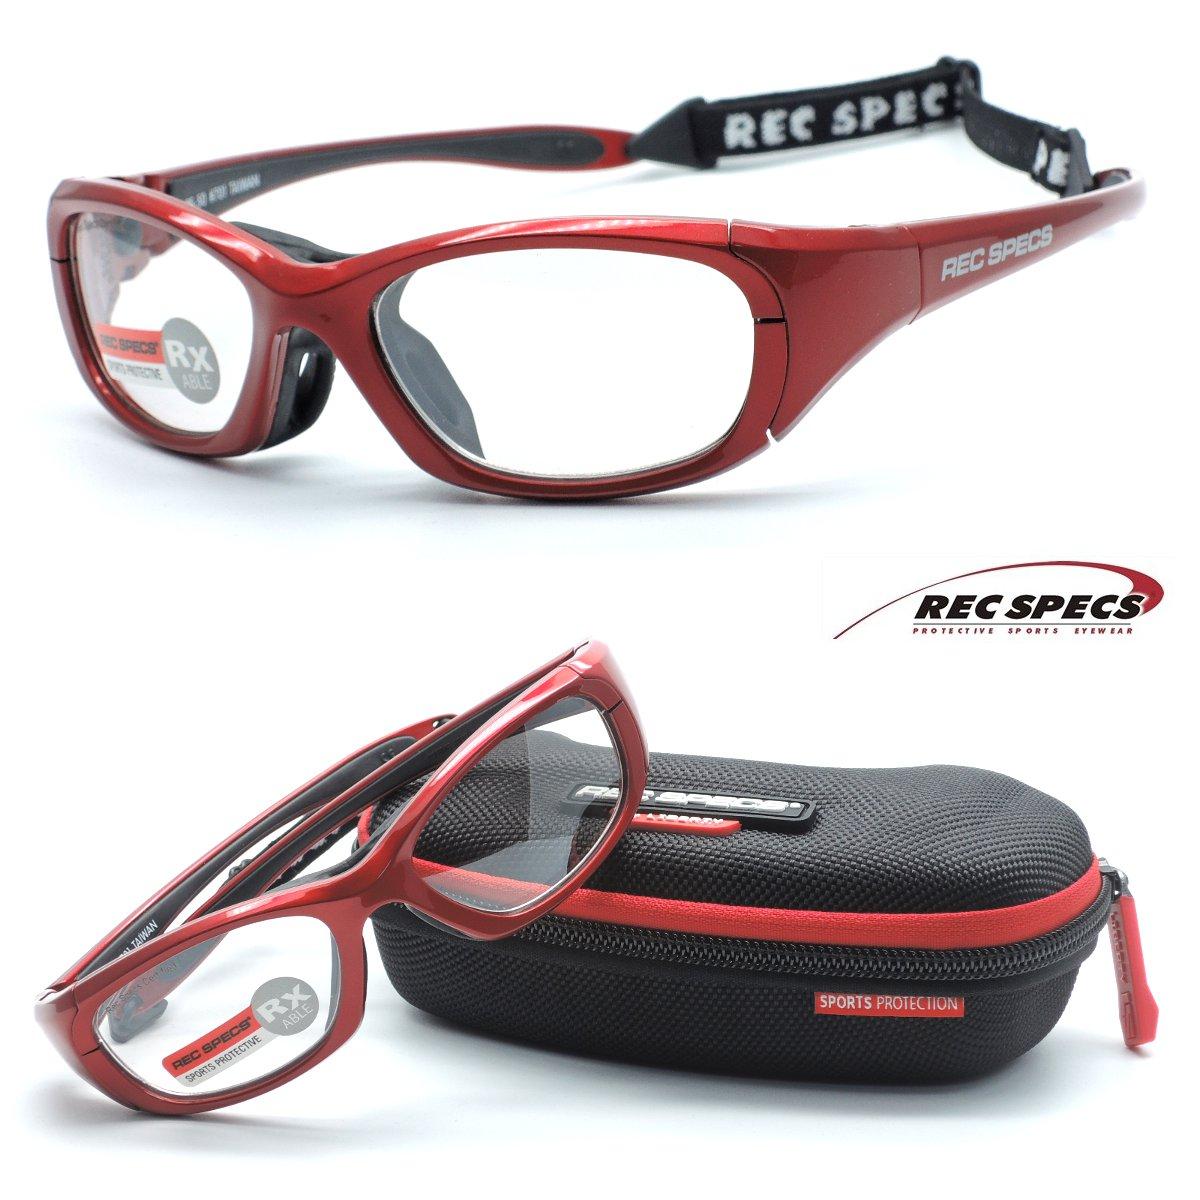 【REC SPECS】レックスペックス RS-50 #701 レッド 子供用スポーツアイウエア 度付レンズ込【正規品】【店内全品送料無料】スポーツゴーグル カッコイイキッズメガネ